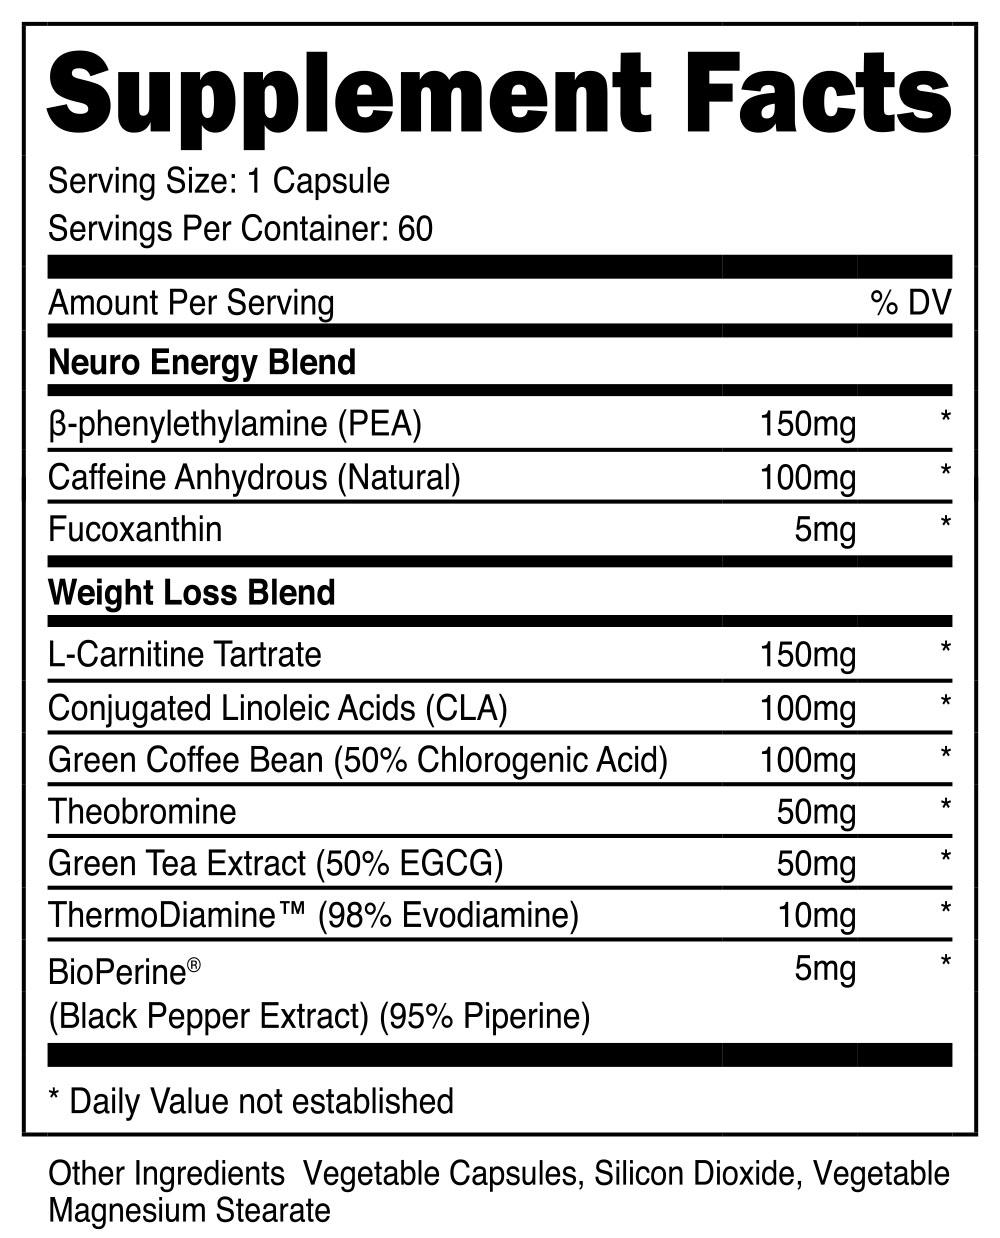 Apidren Supplement Facts